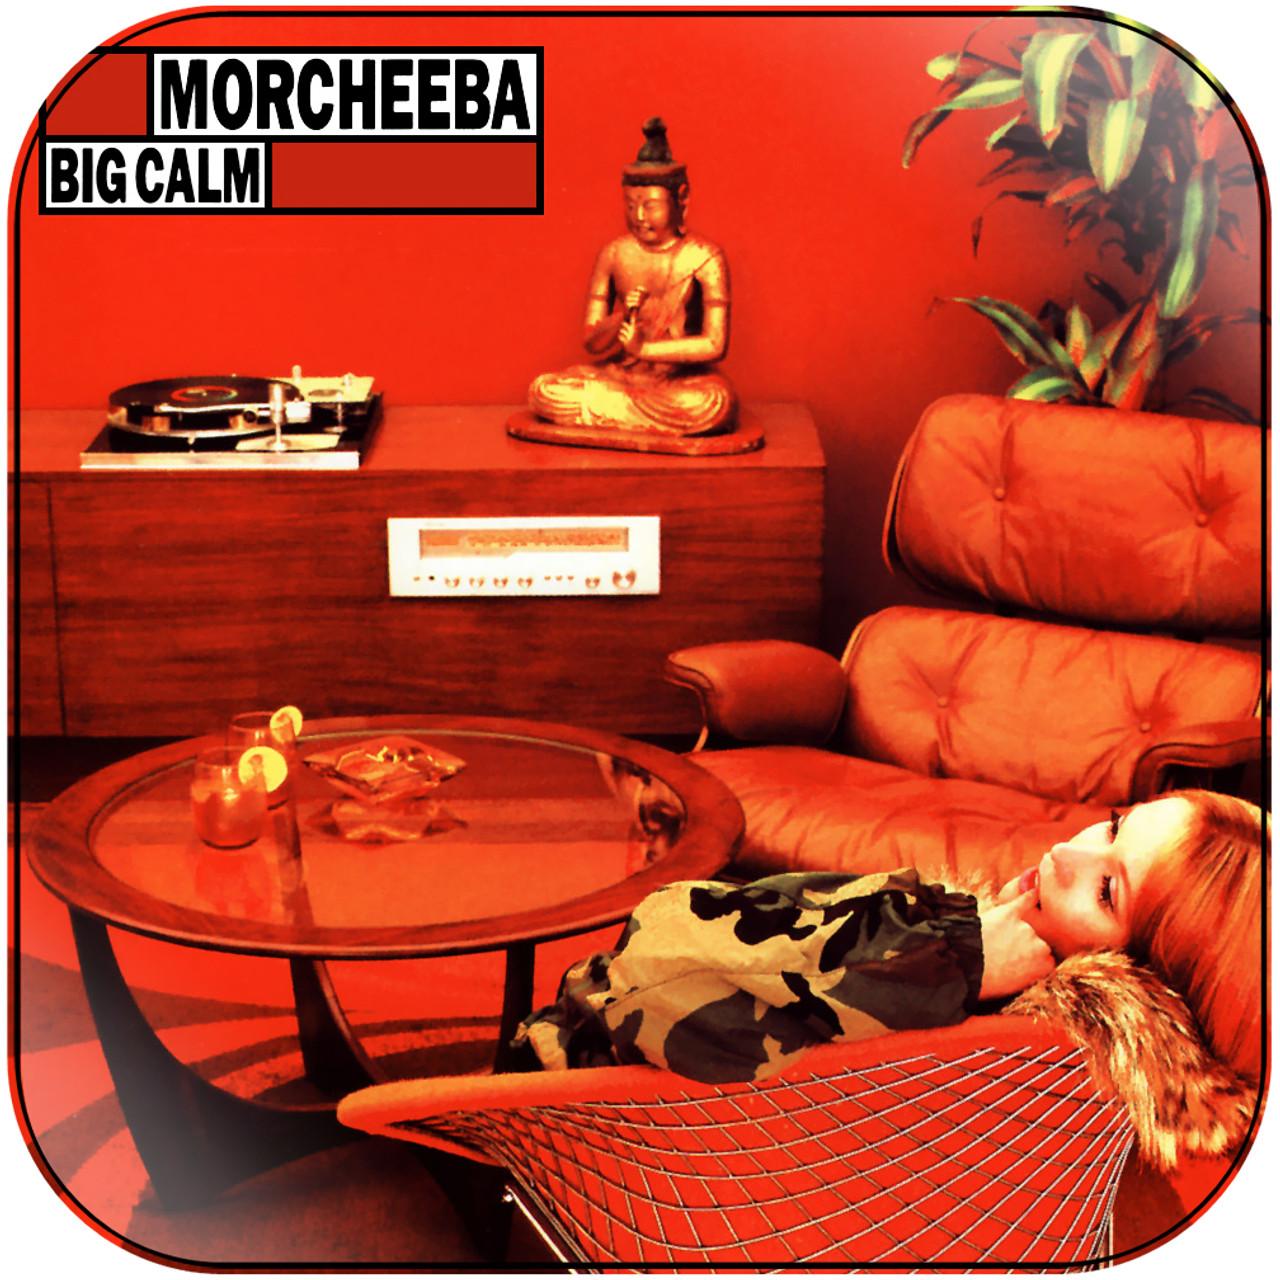 Morcheeba Big Calm Album Cover Sticker